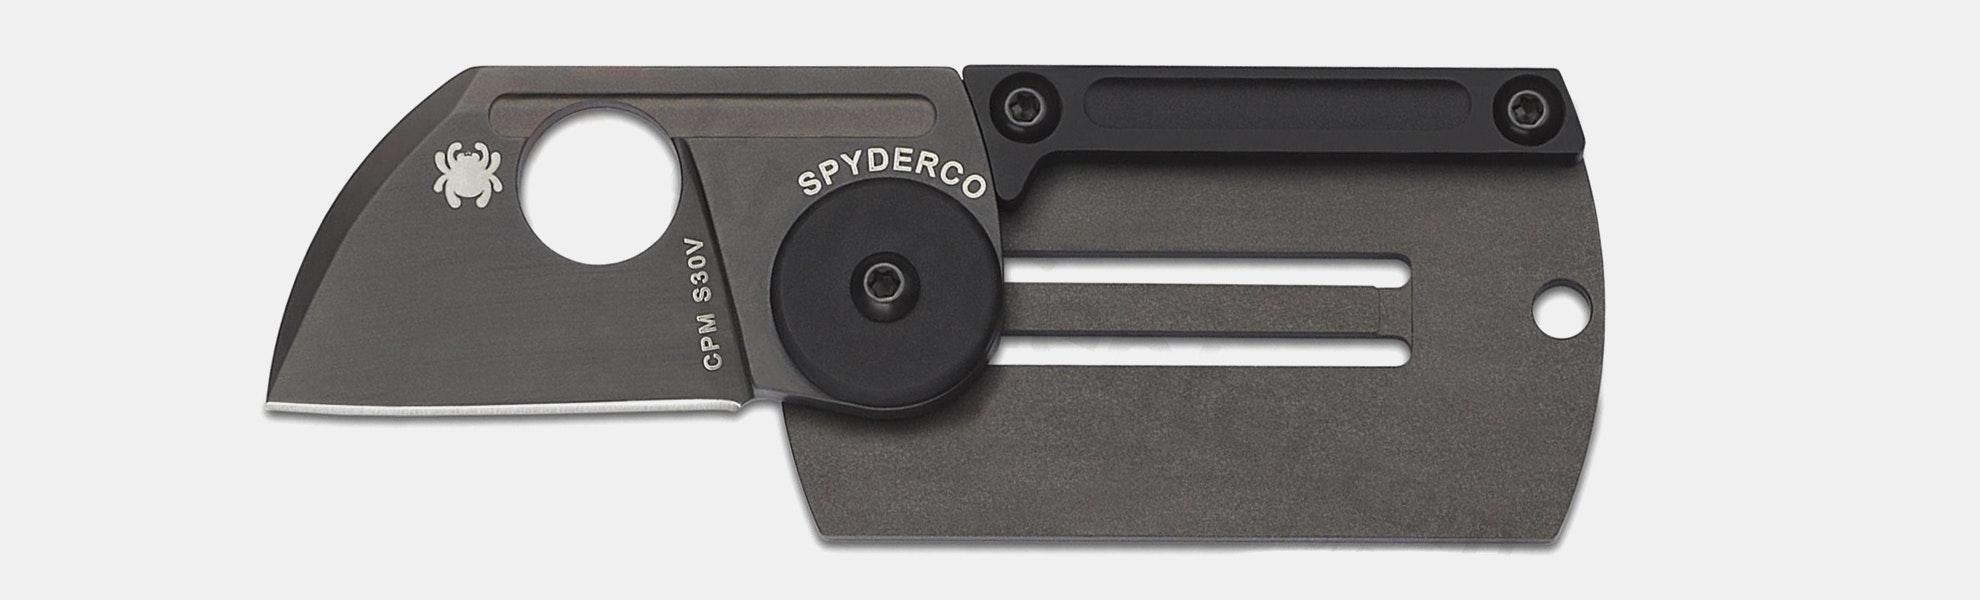 Spyderco Dog Tag Folder and JetBeam Very Tiny Light